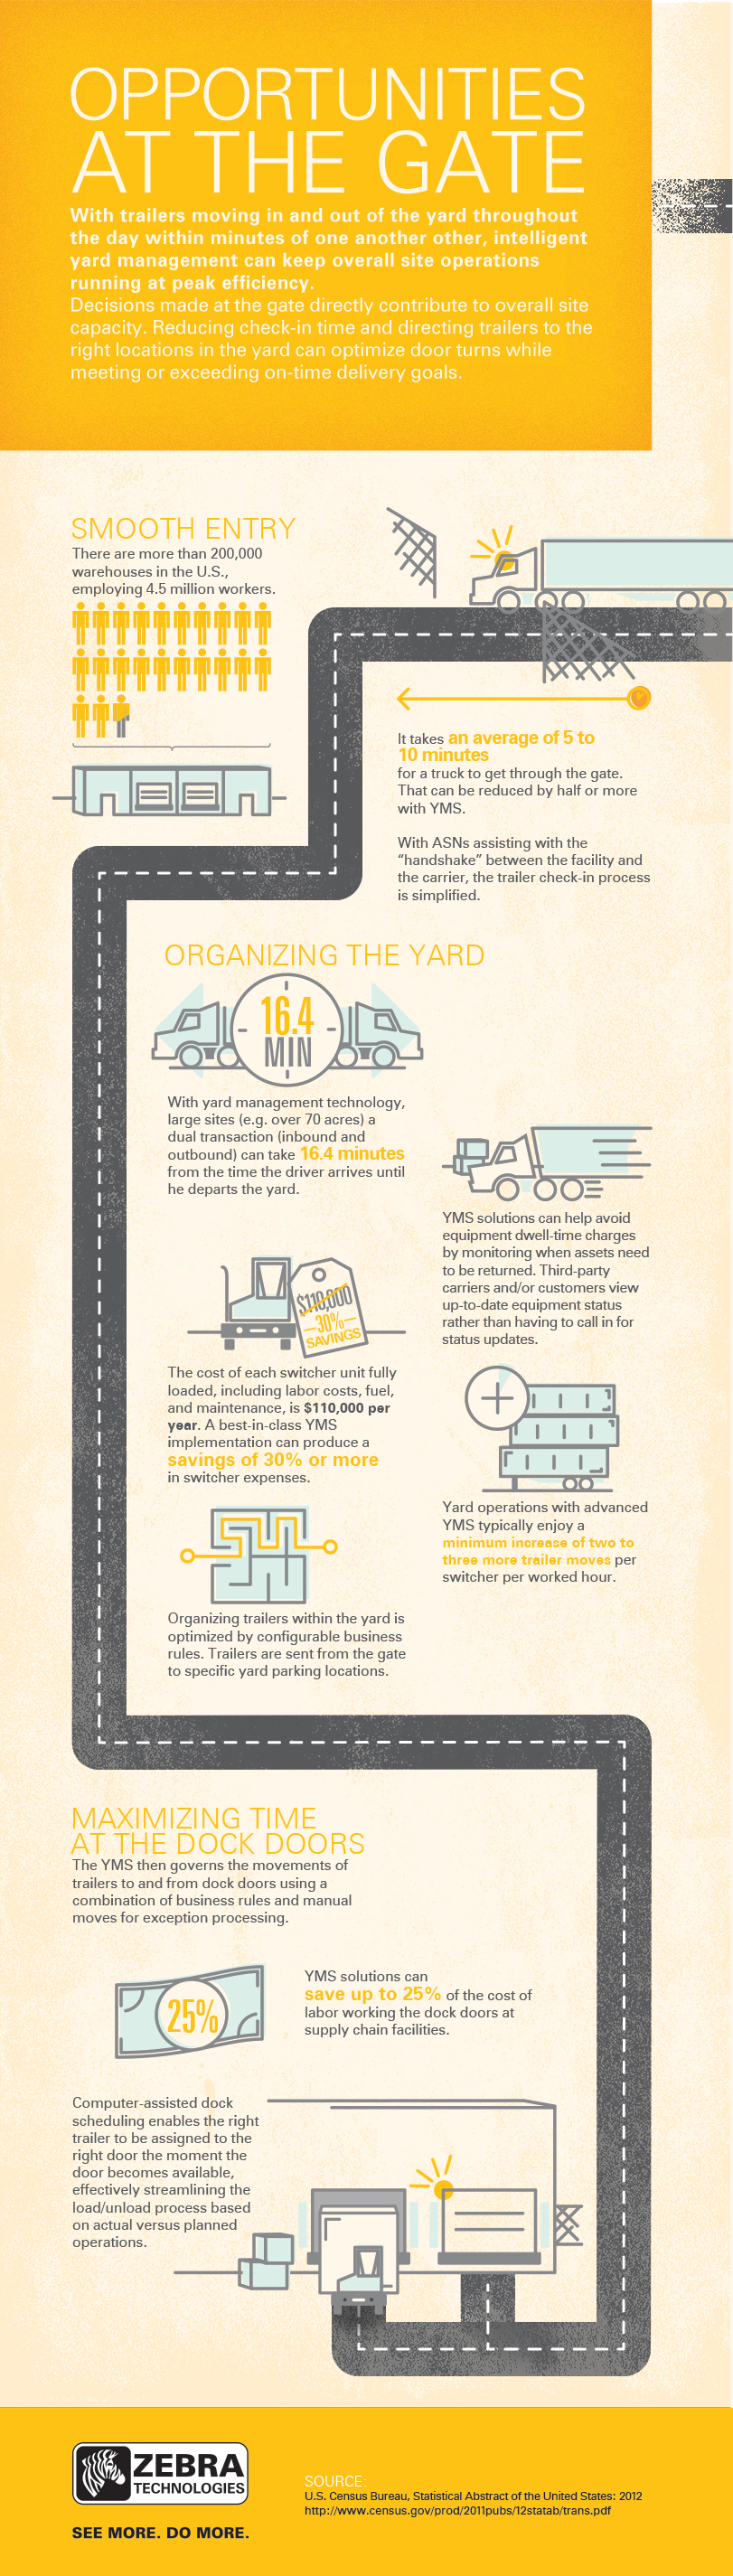 Zebra Technologies Infographic